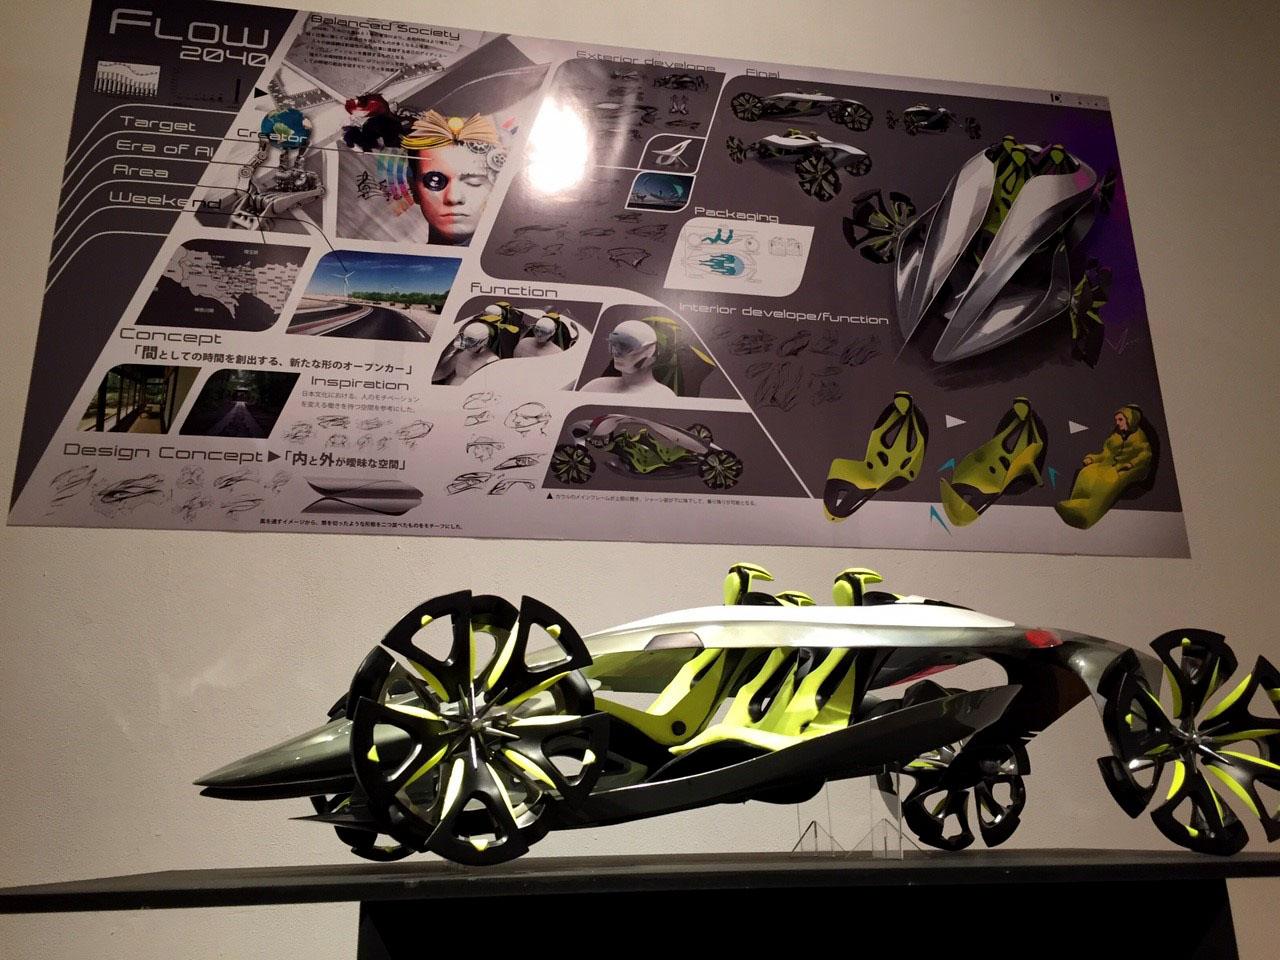 TITAN3Dプリンターで美大生が作った作品のご紹介